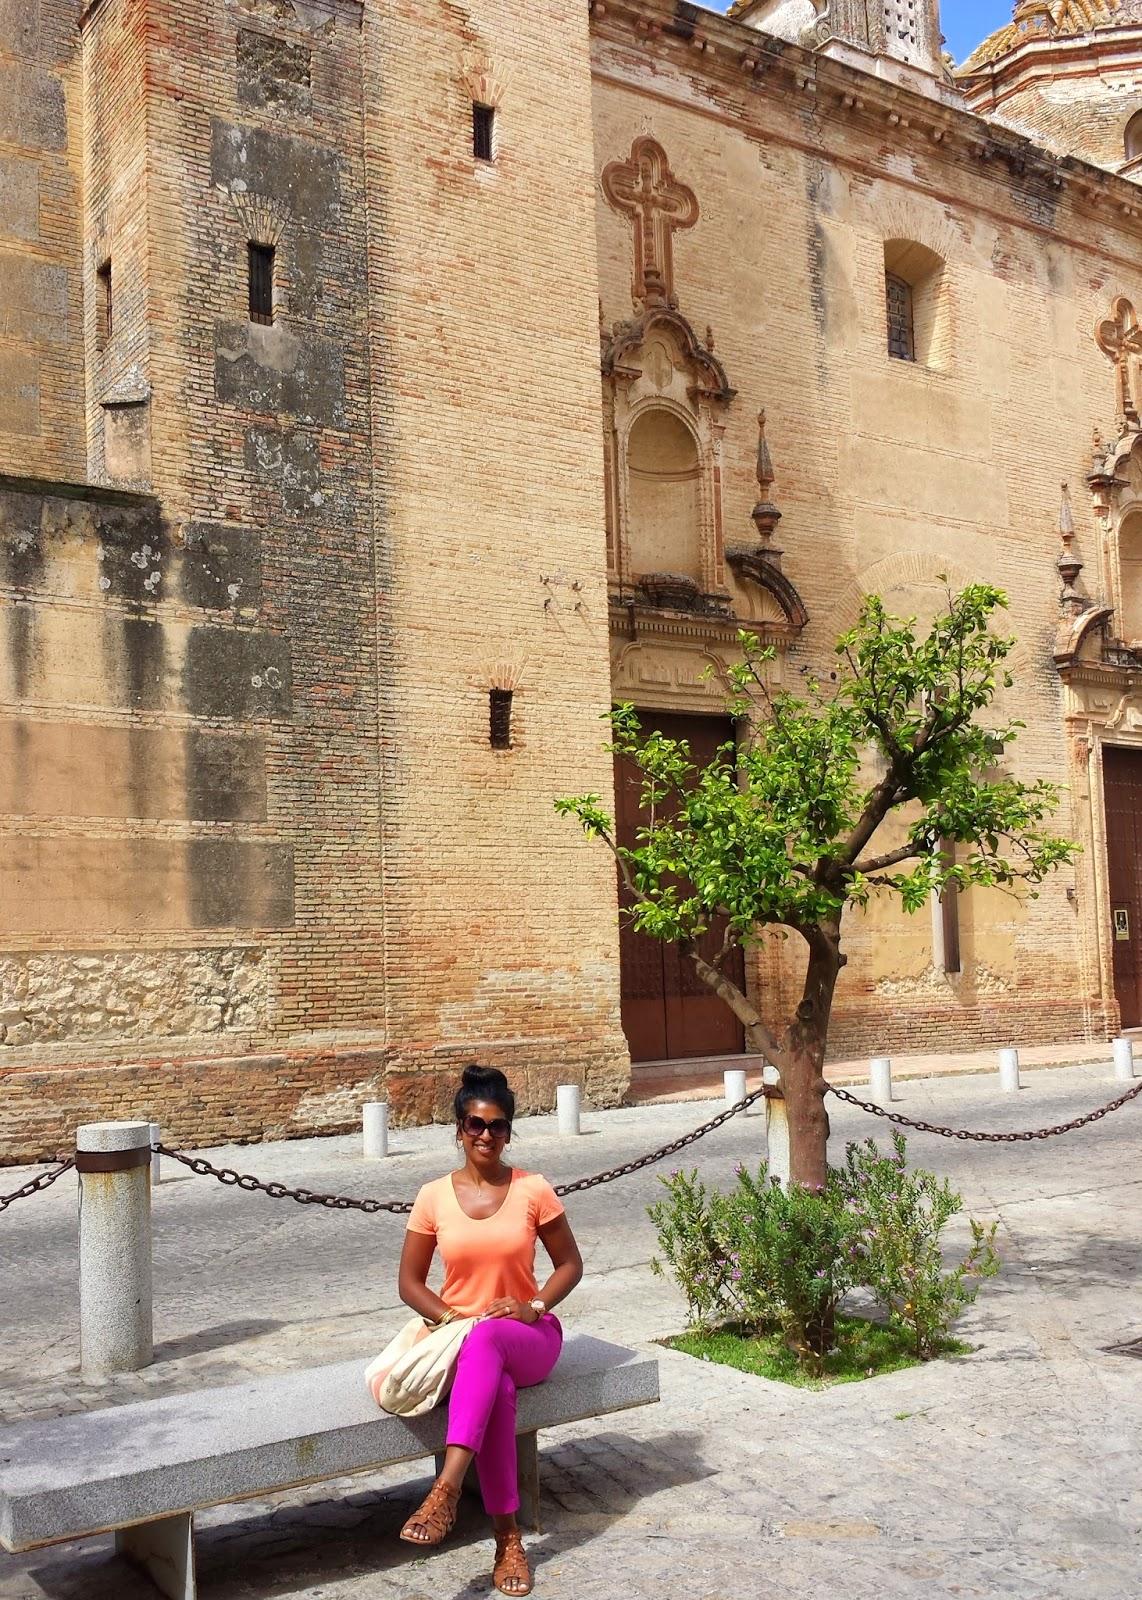 Cathedral of Carmona  |  Postcard from Andalucía: Jerez + Carmona  on afeathery*nest  |  http://afeatherynest.com